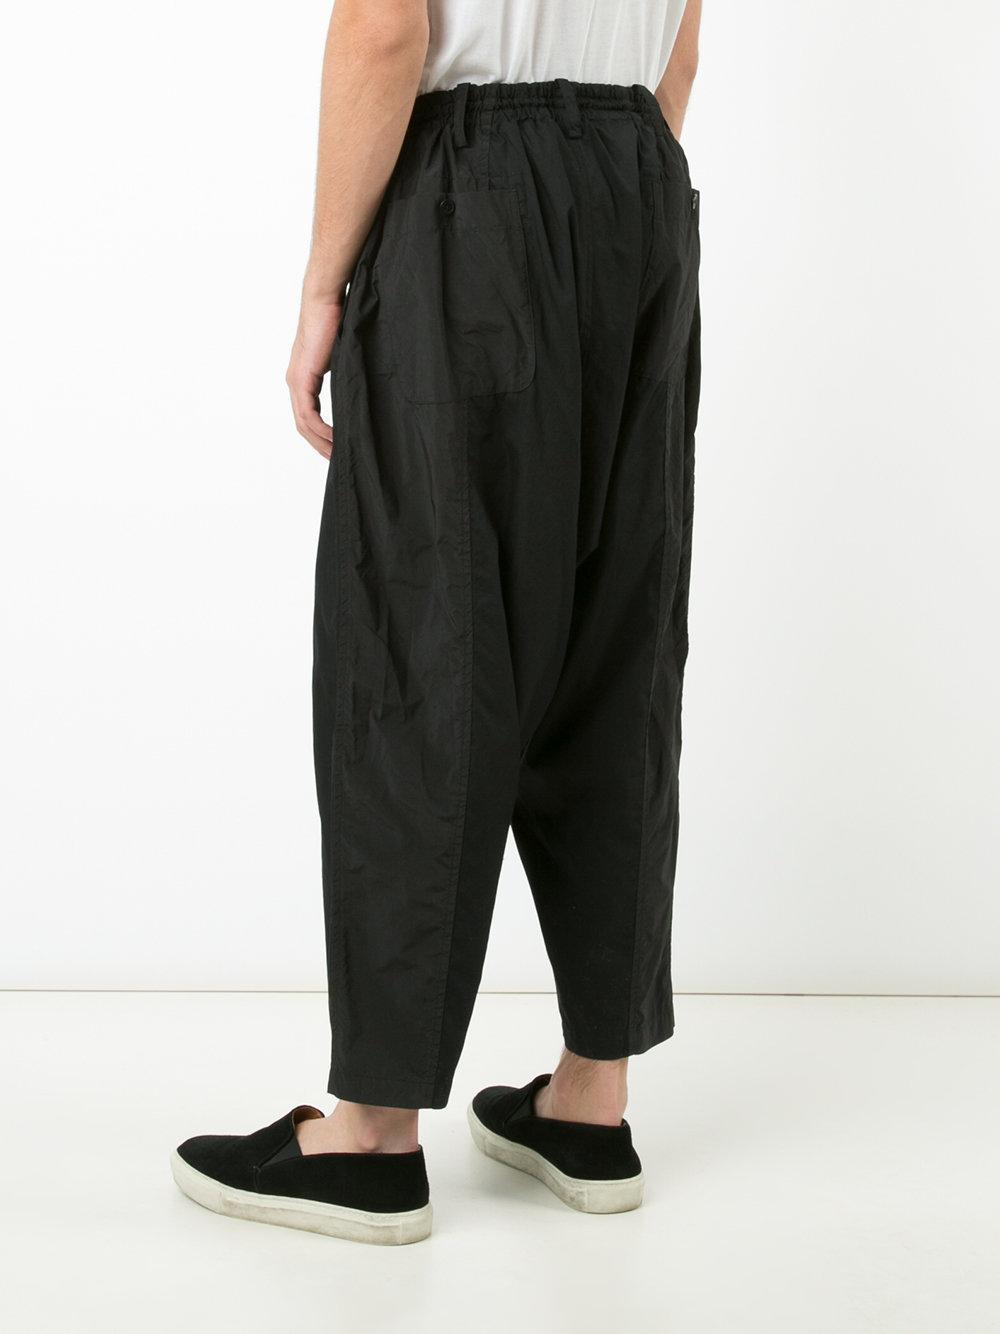 Sarouel Pants Fashion